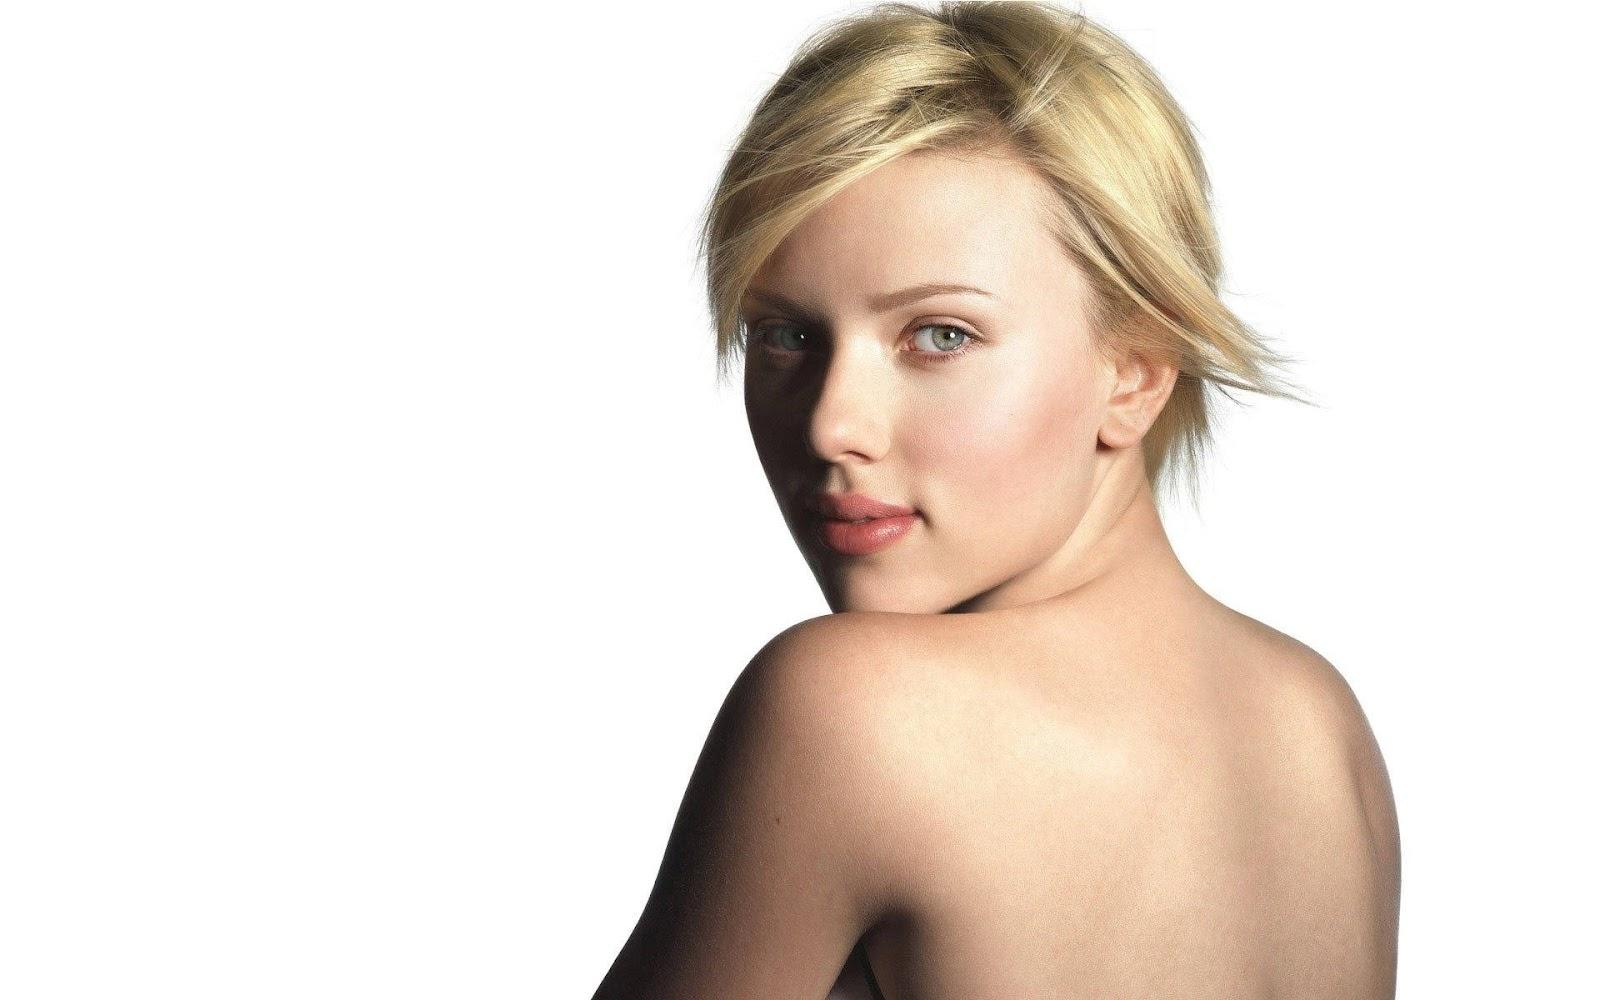 High Quality Hds Pics Of Scarlett Johansson As Redhead: Scarlett Johansson 1080p Wallpaper